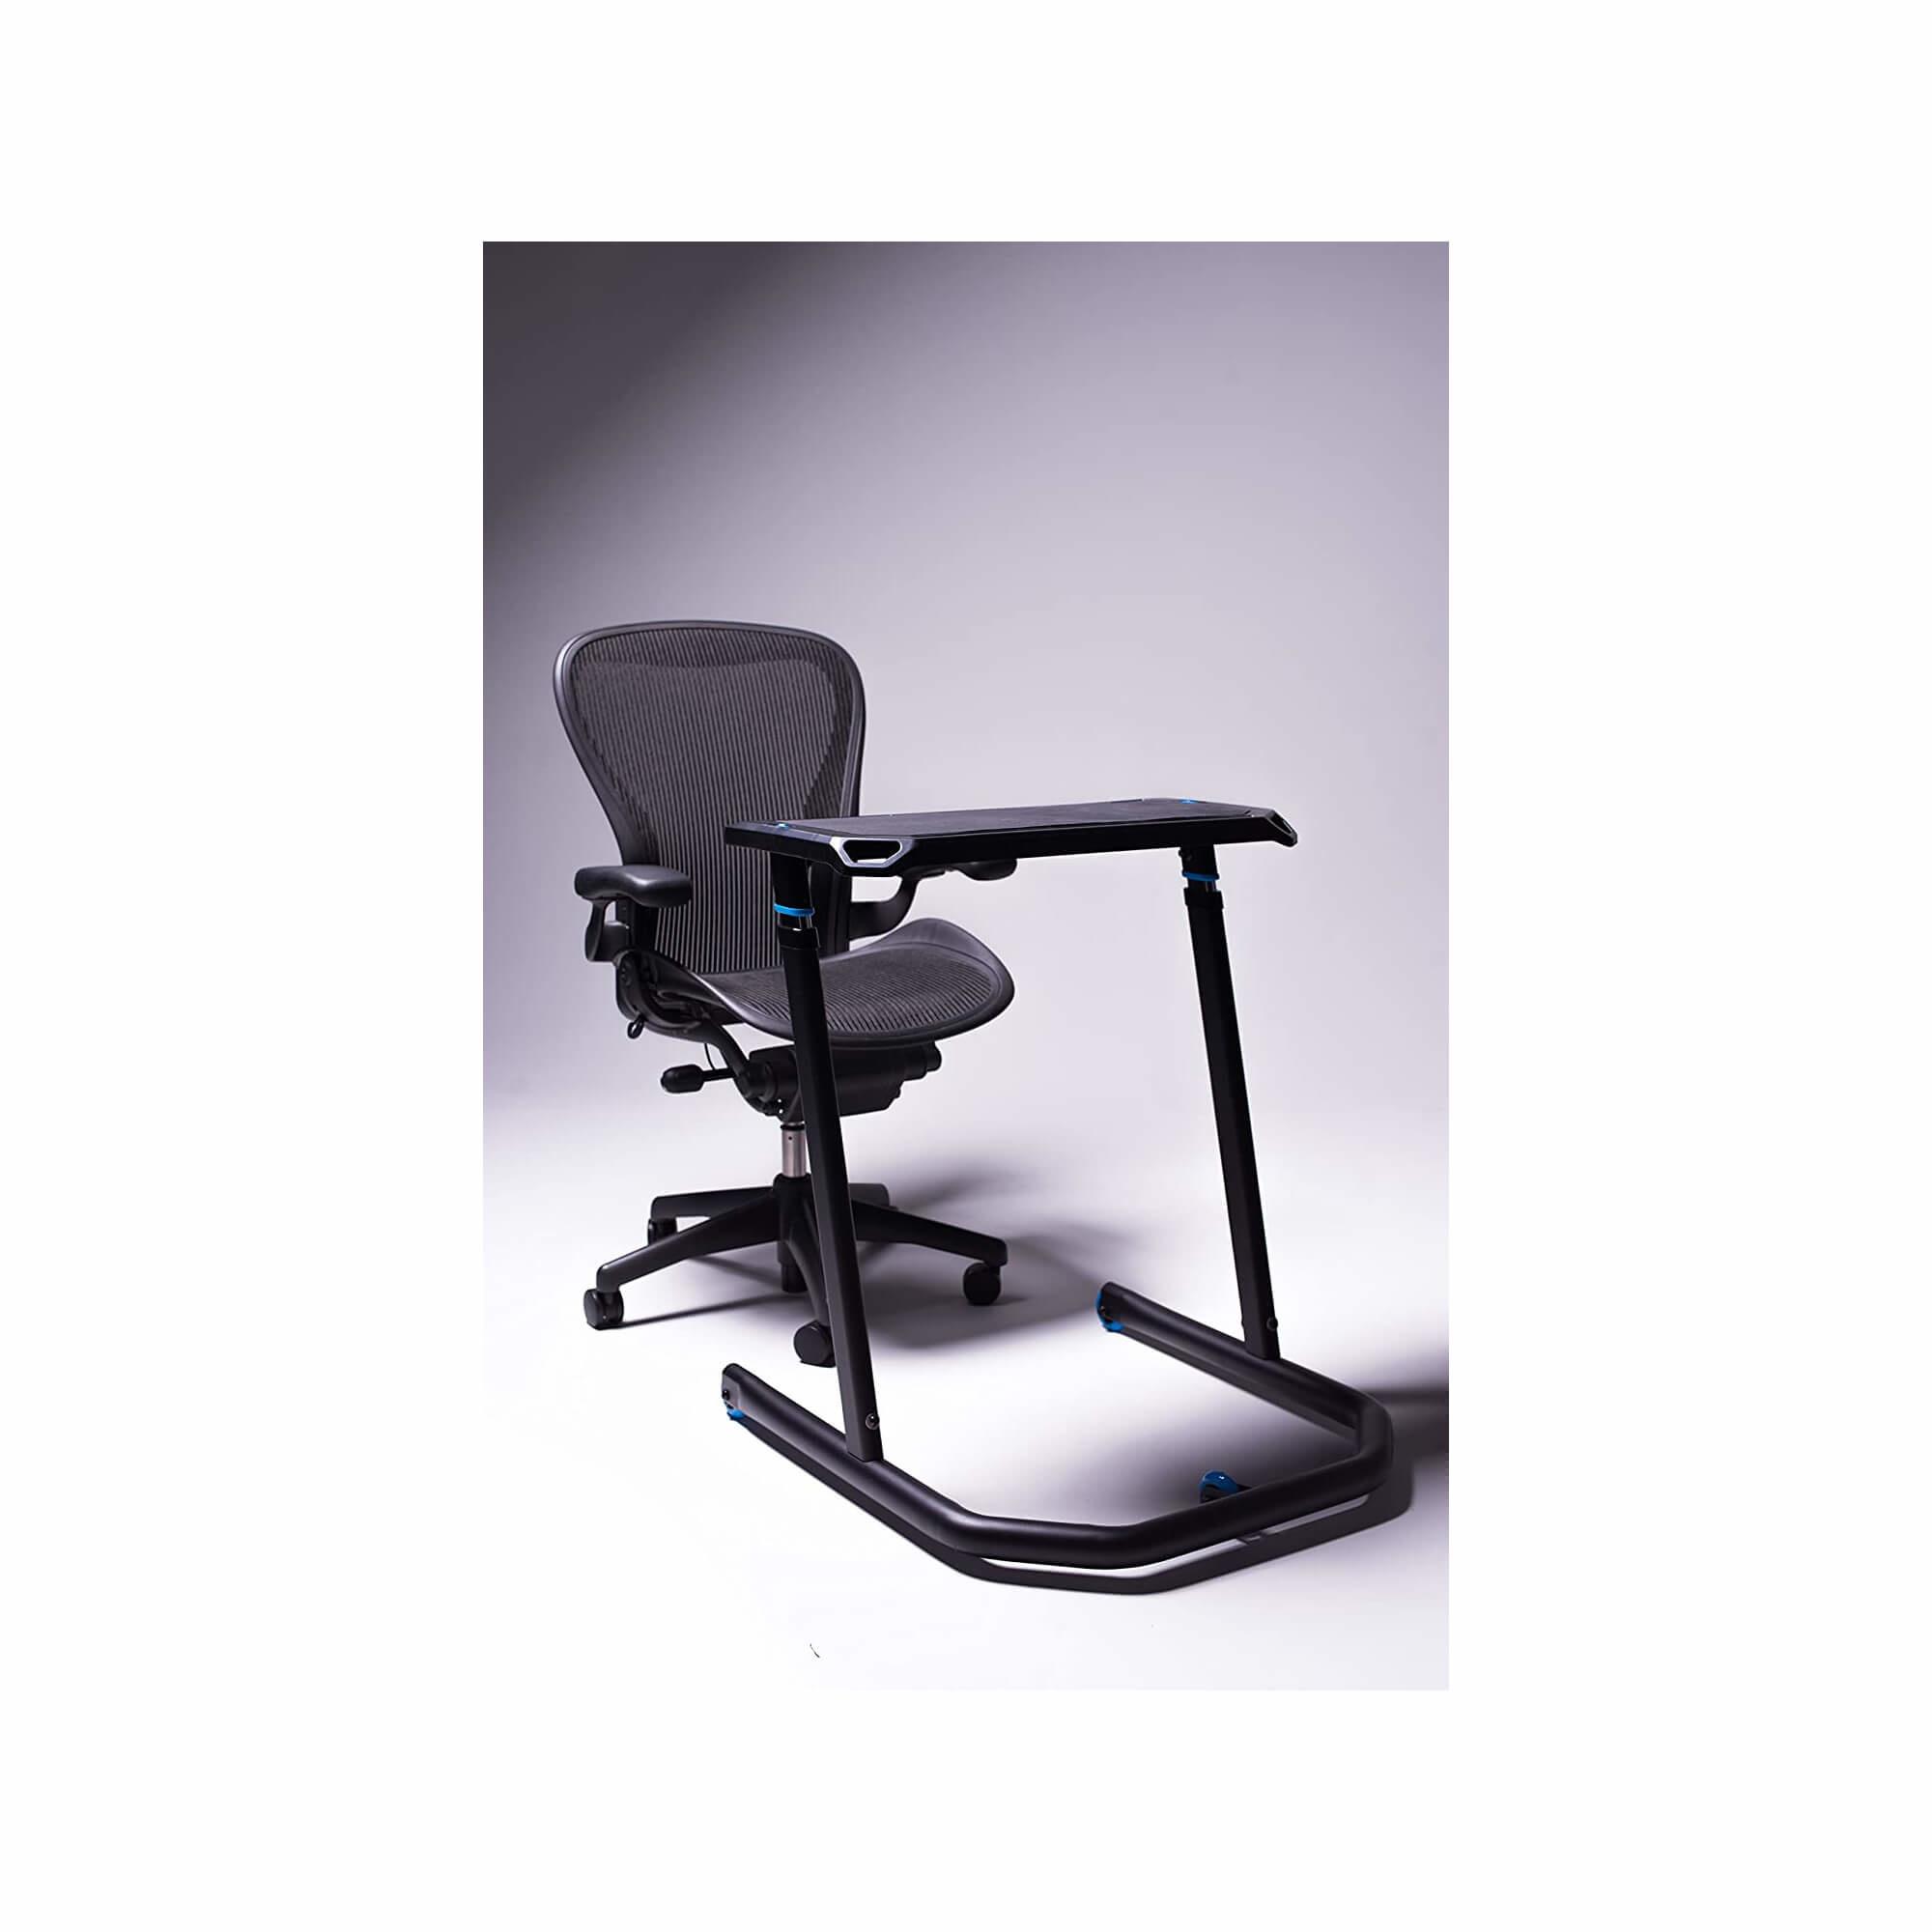 Kickr Fitness Desk-10